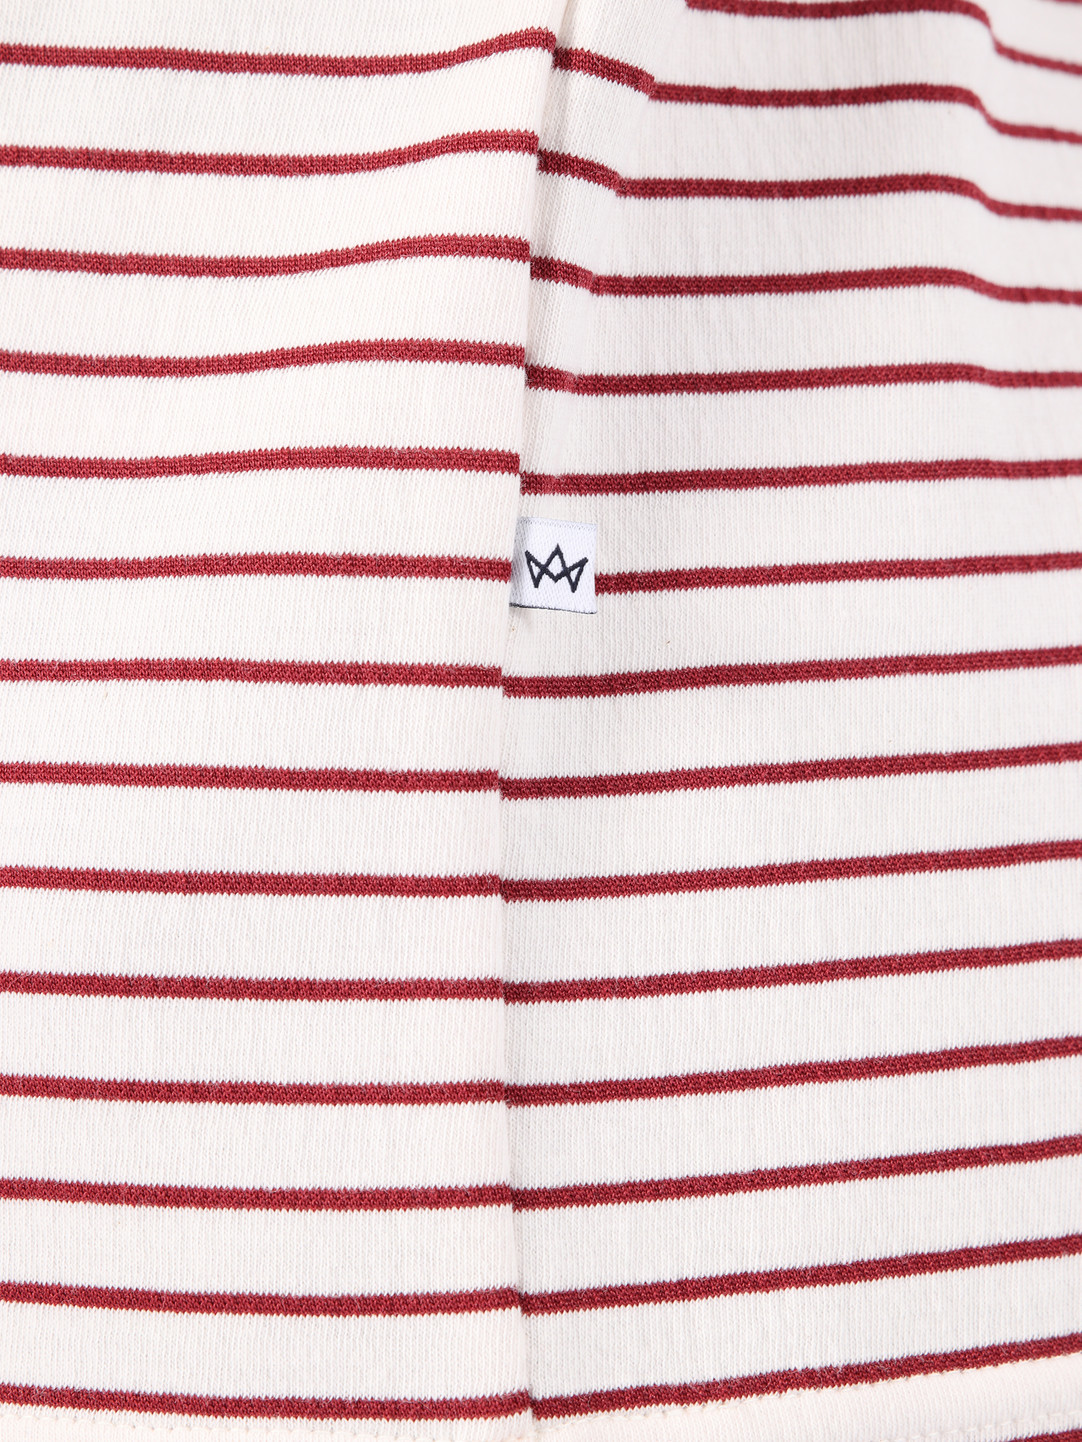 Kronstadt Kronstadt Melta T-Shirt Off White Red KS2699